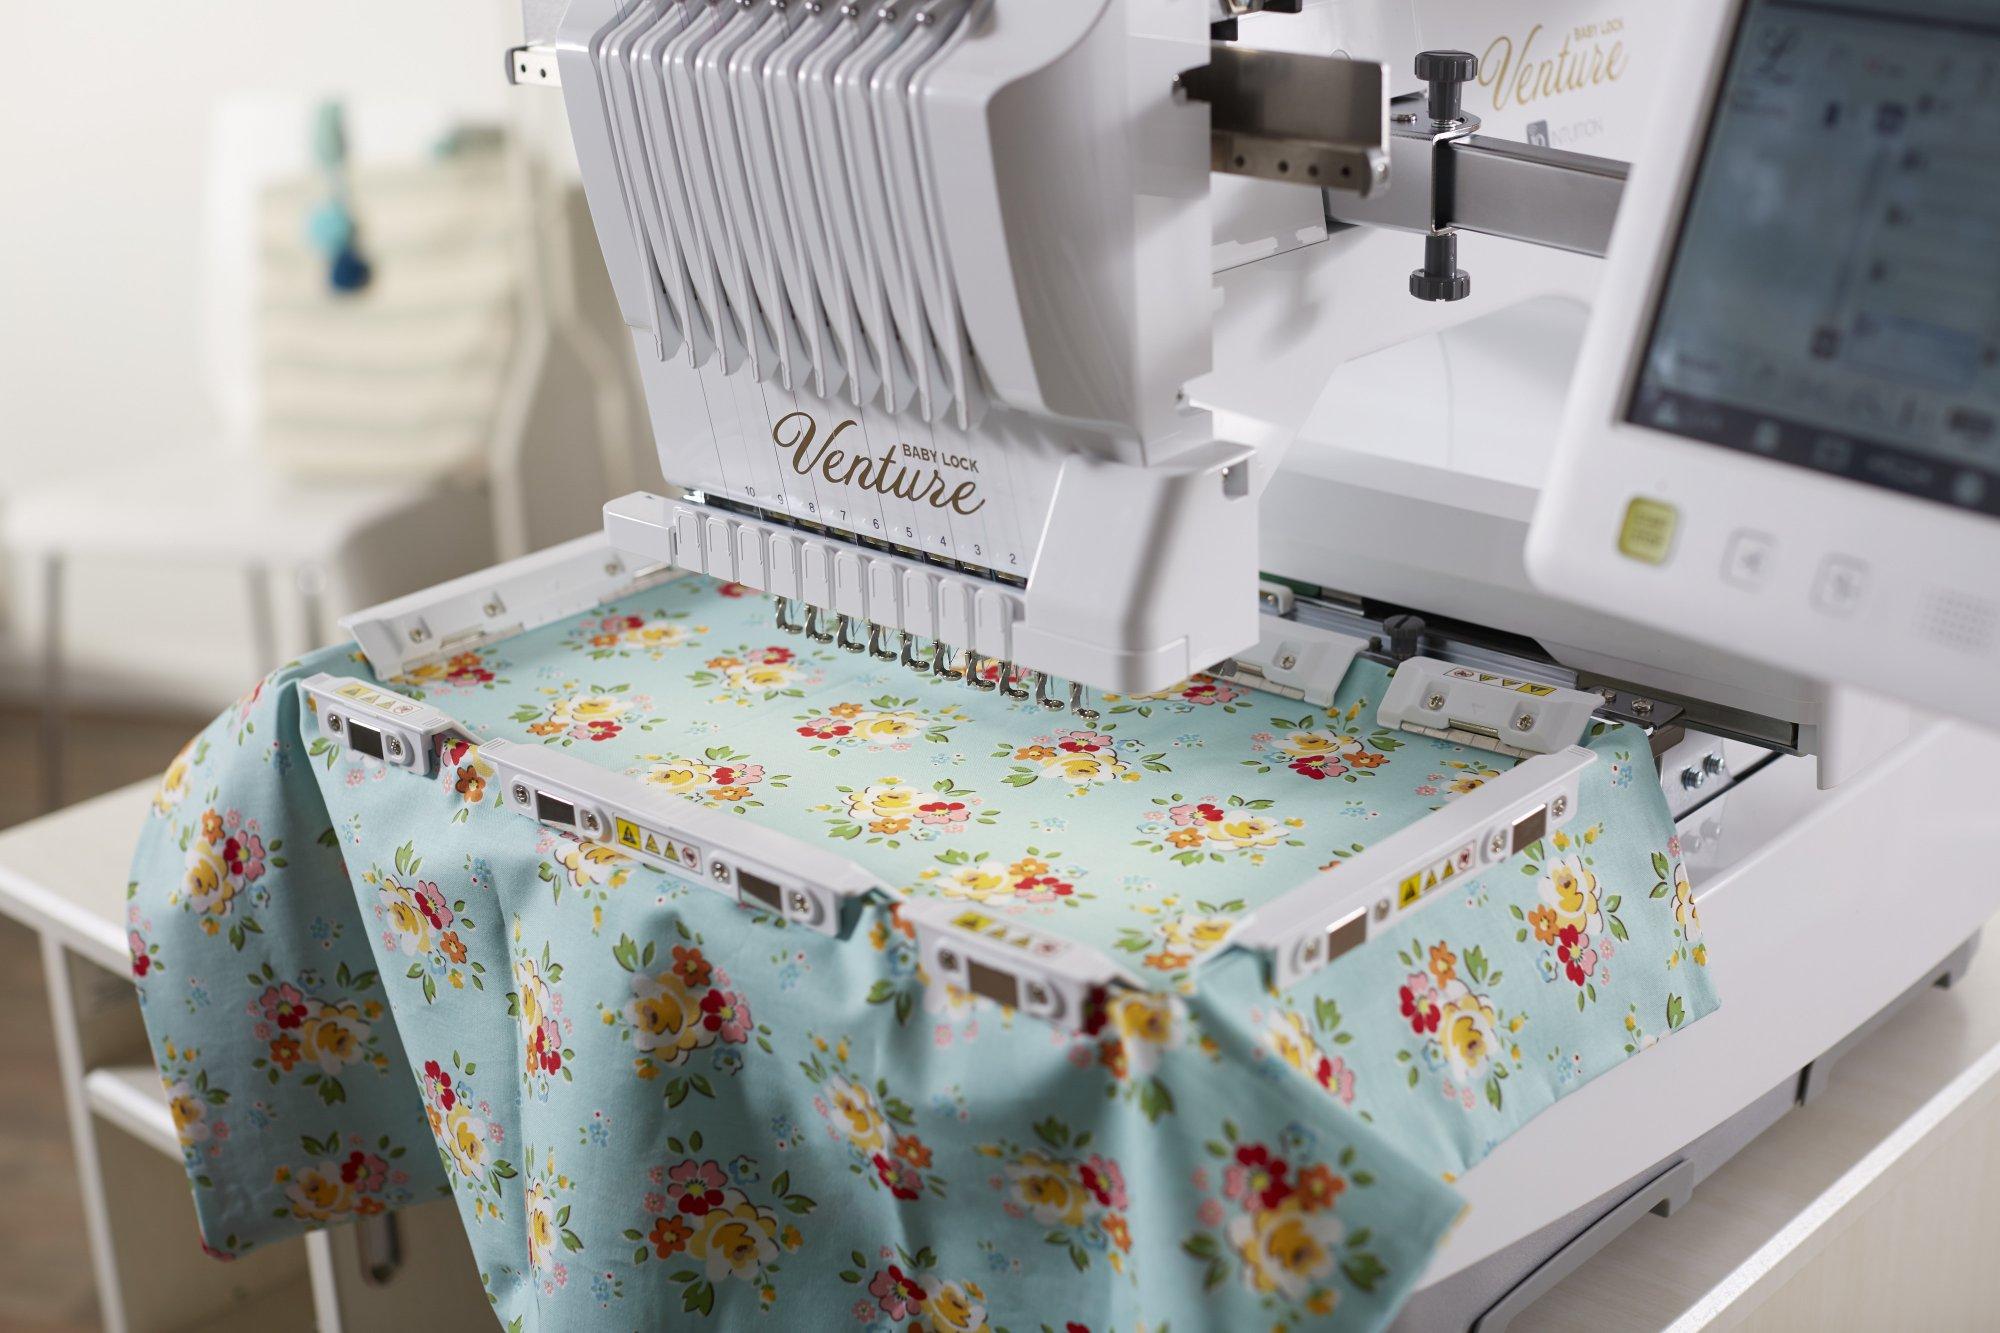 Babylock Magnetic Embroidery Hoop - Venture